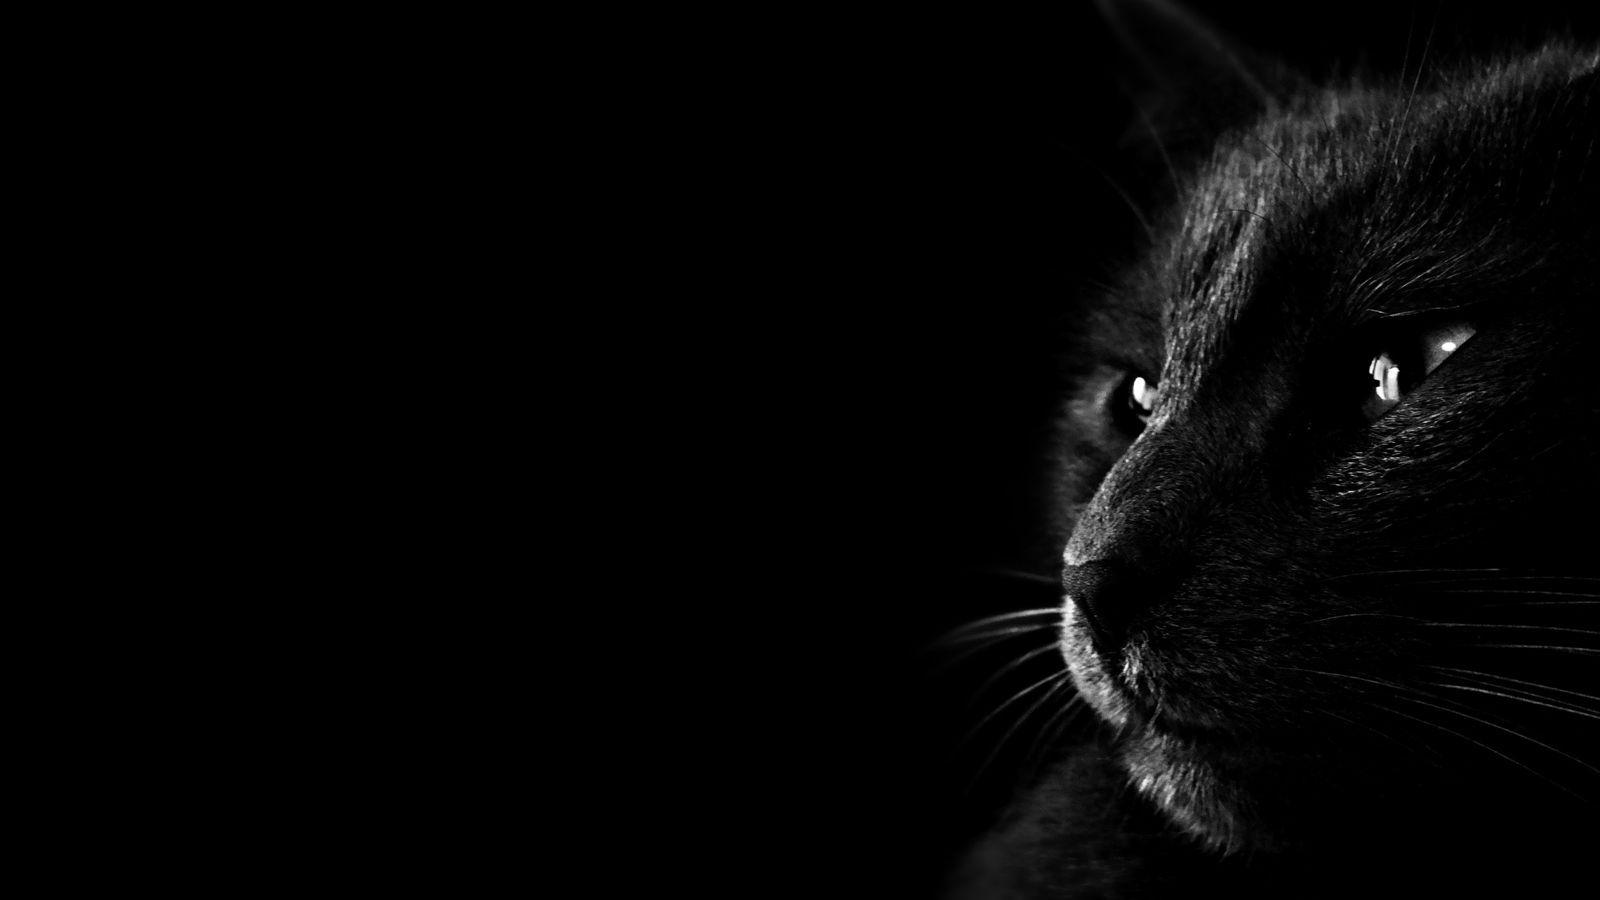 Cat Dark Wallpaper | Wallpaper | Cat wallpaper, Black wallpaper, Dark wallpaper